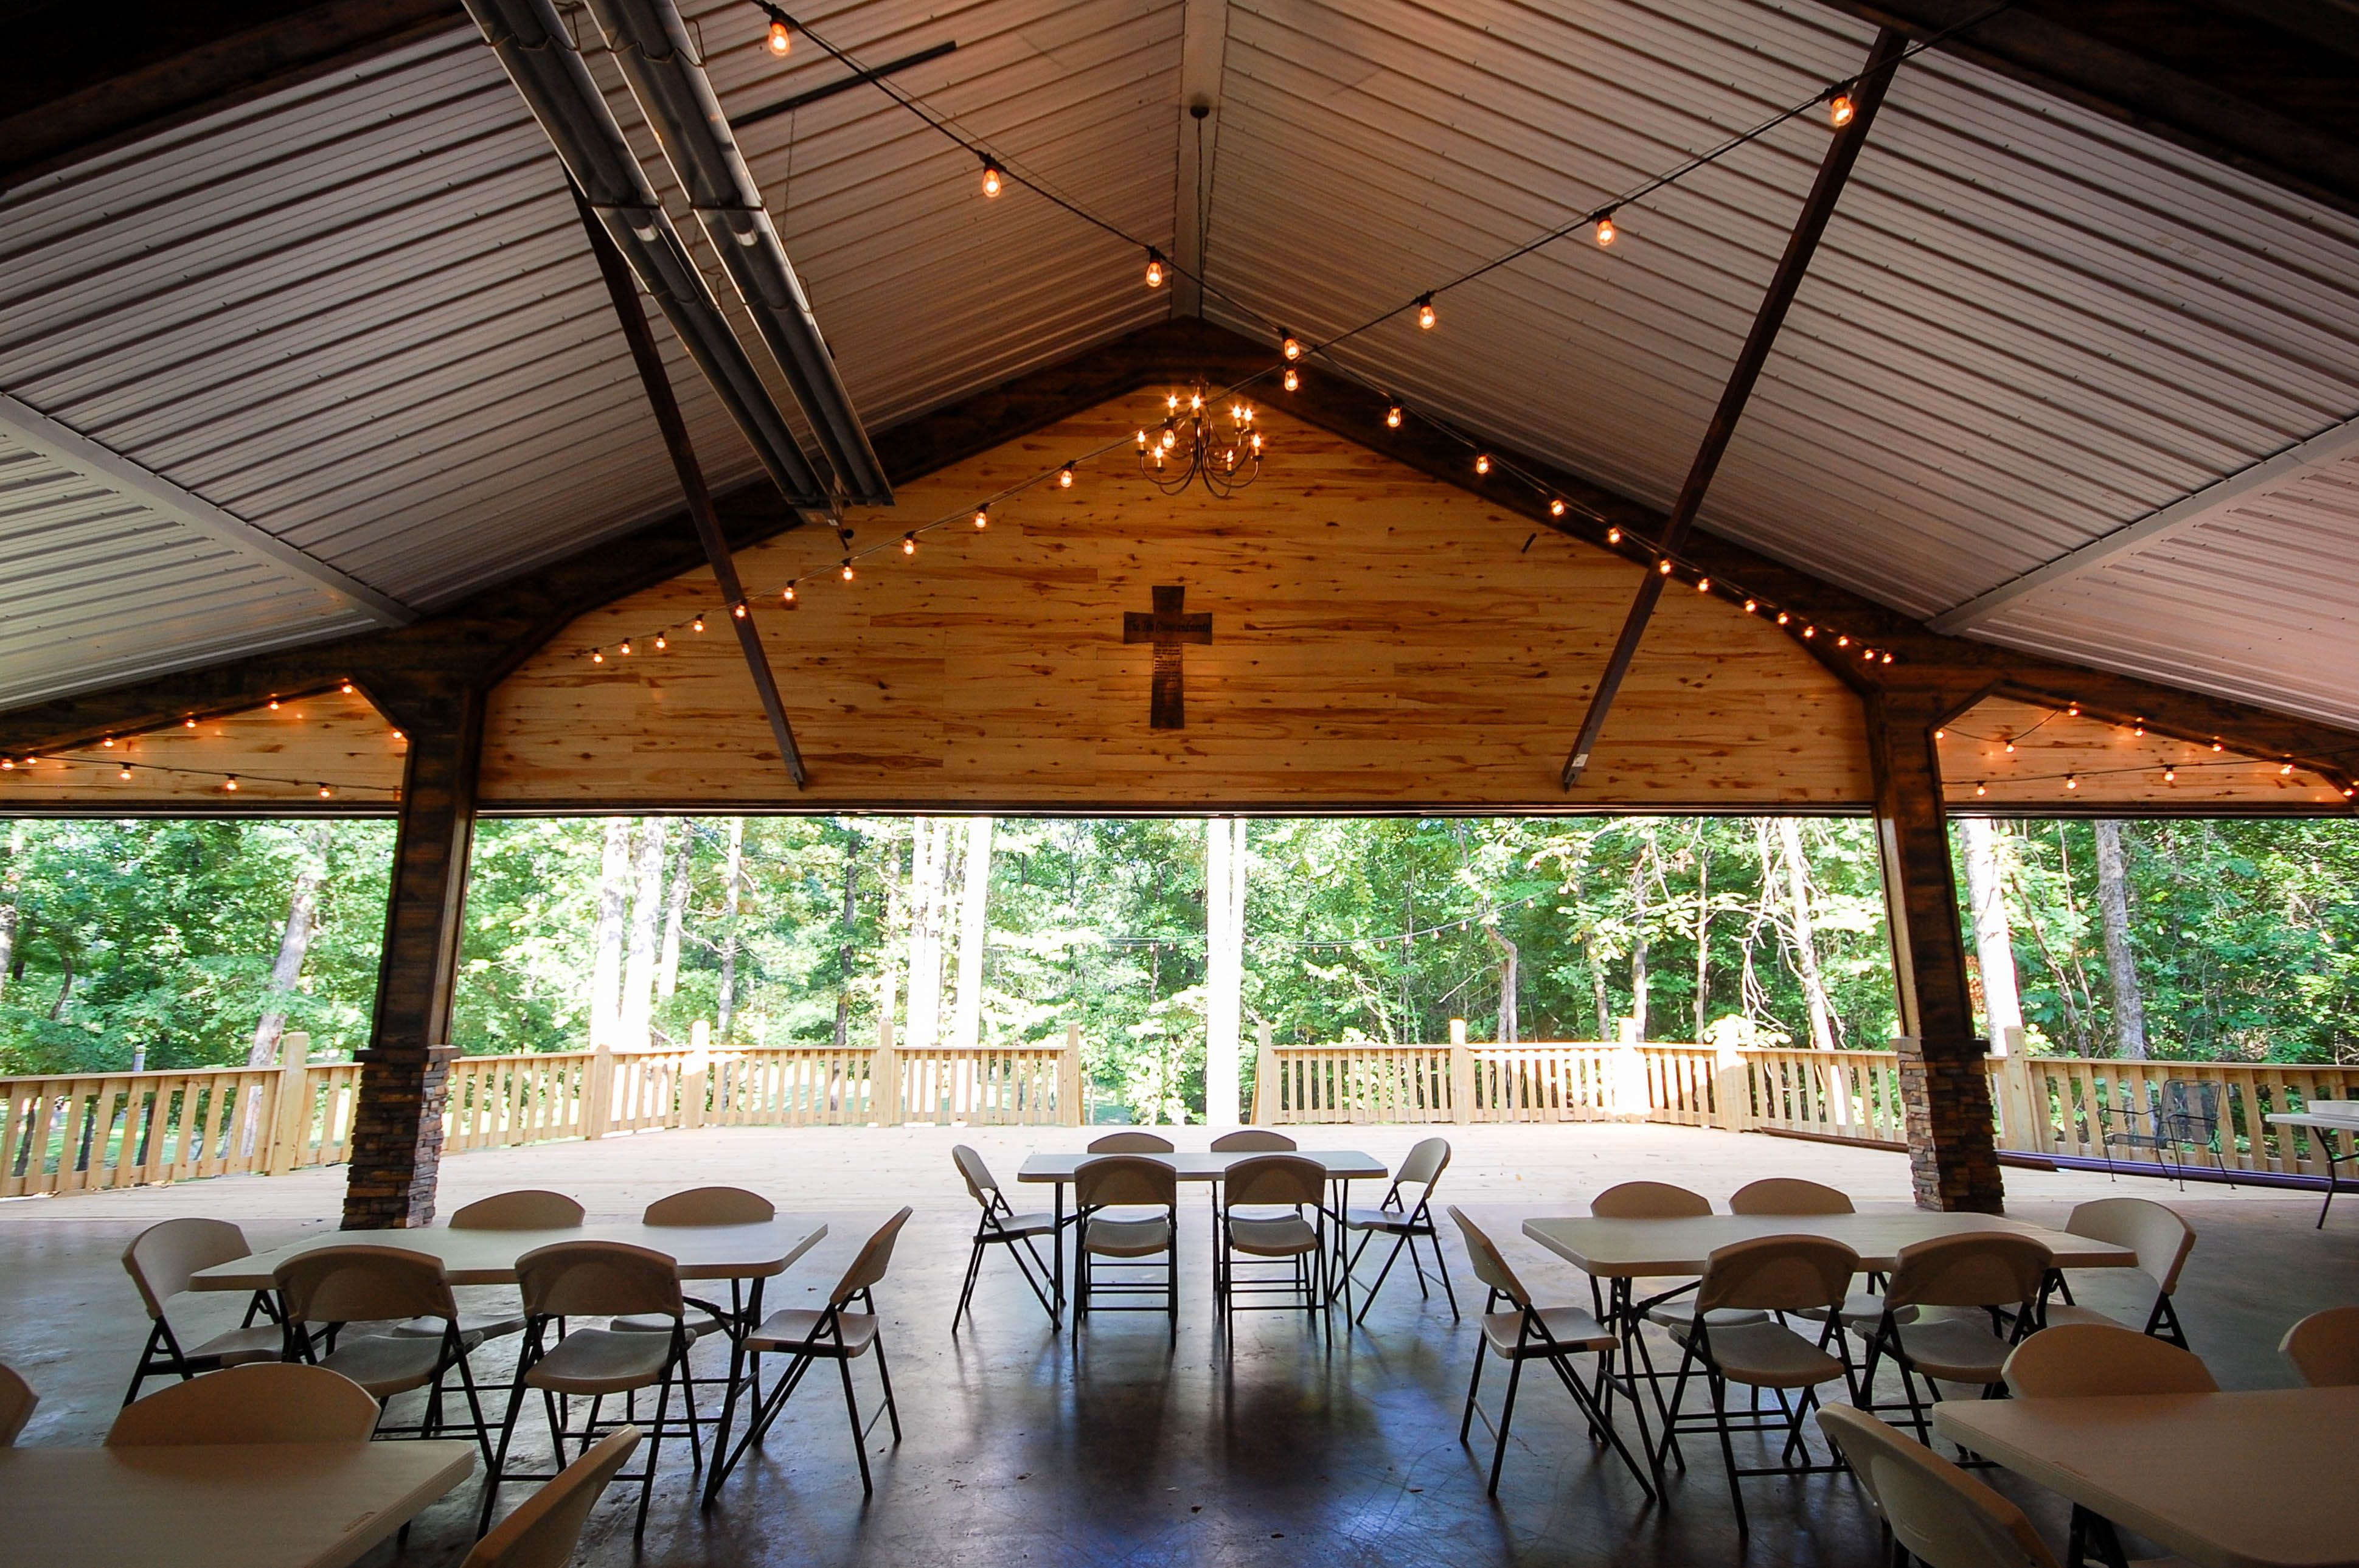 White Oaks Venue Beautiful Broken Bow Oklahoma Www Whiteoaksvenue Com Venues Broken Bow Cabin Rooms